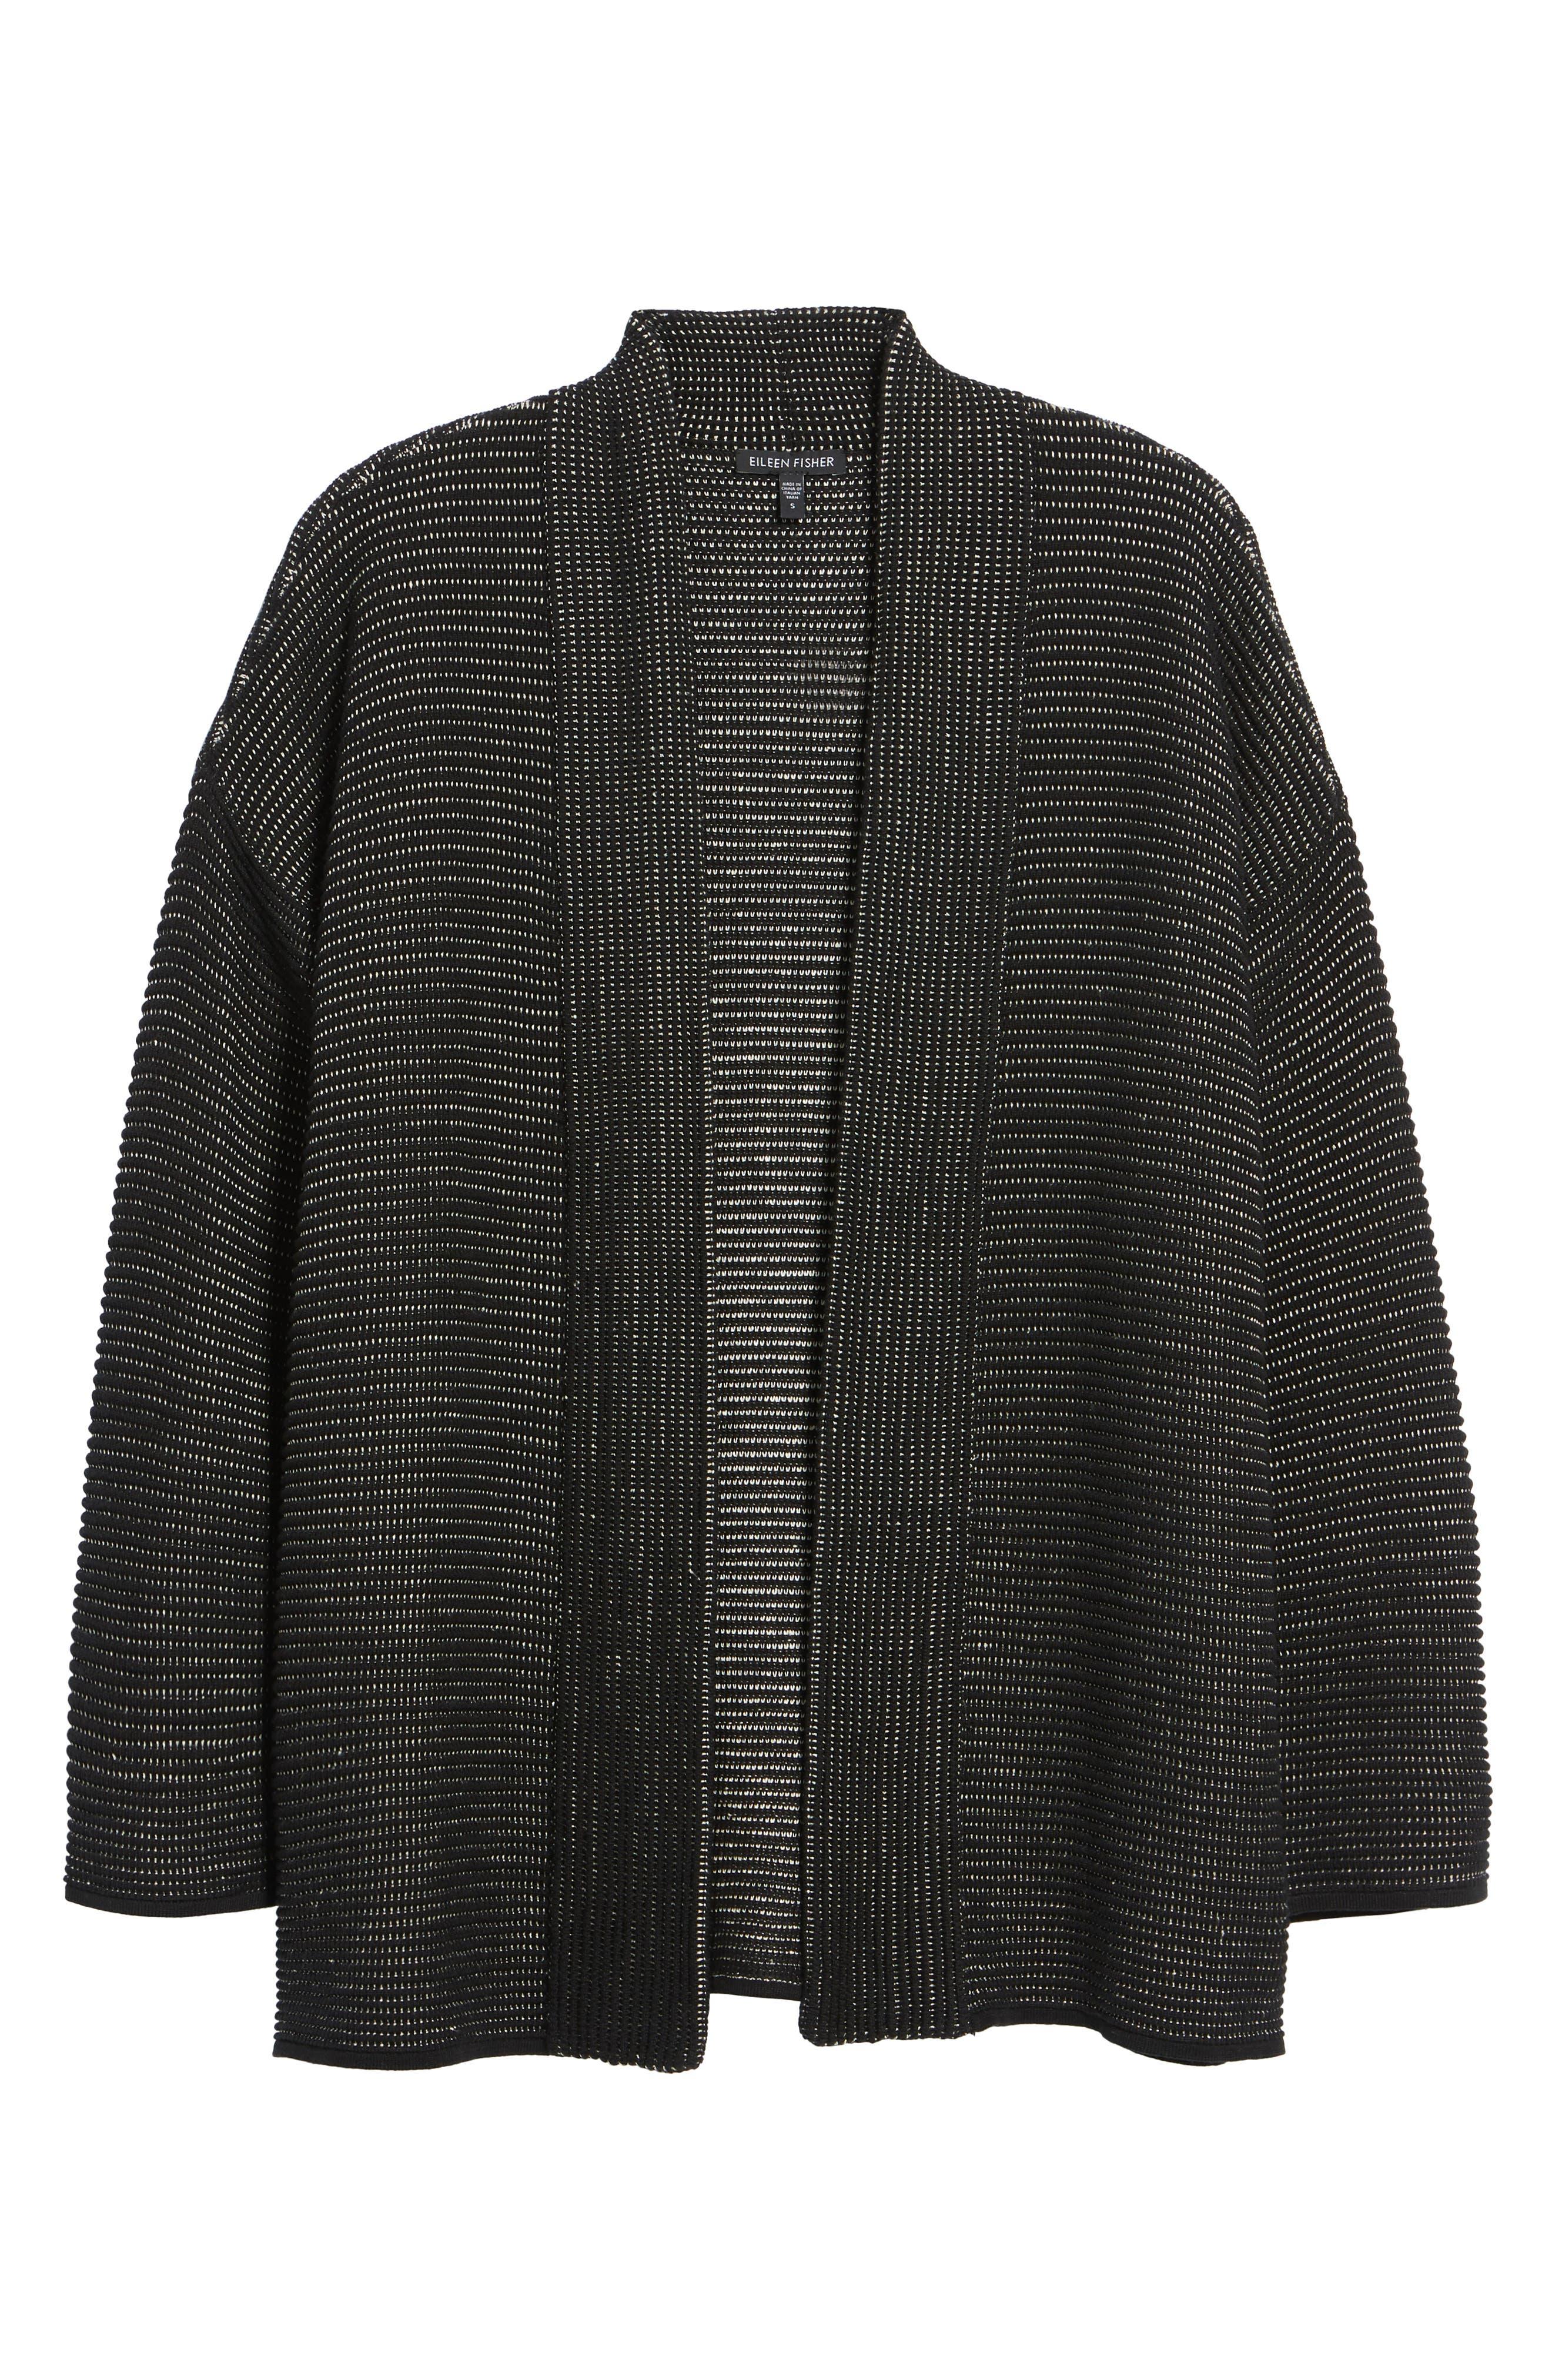 Silk Blend Ottoman Knit Cardigan,                             Alternate thumbnail 6, color,                             008